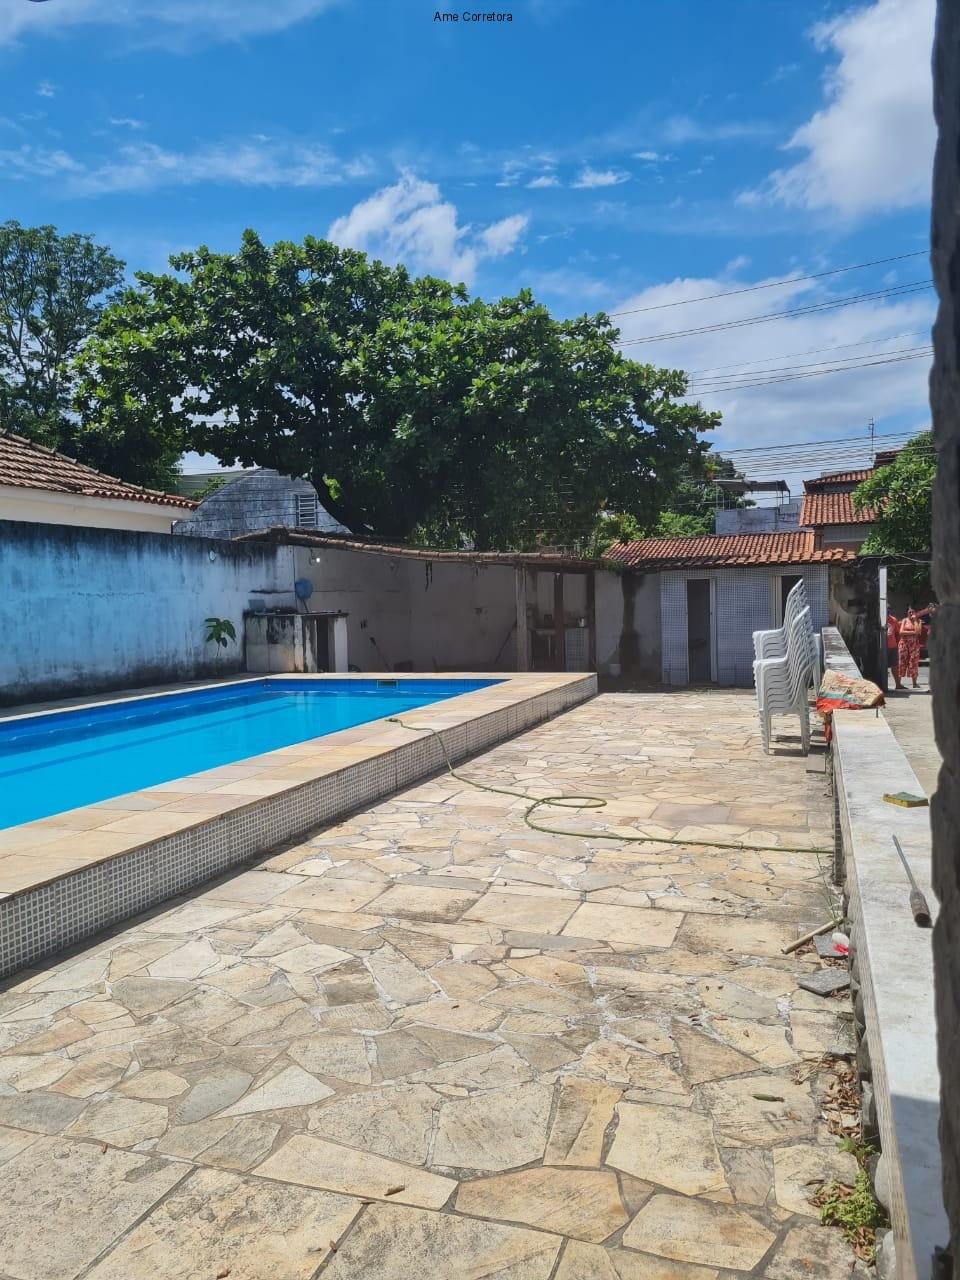 FOTO 03 - Terreno à venda Bangu, Rio de Janeiro - R$ 1.300.000 - TE00066 - 5